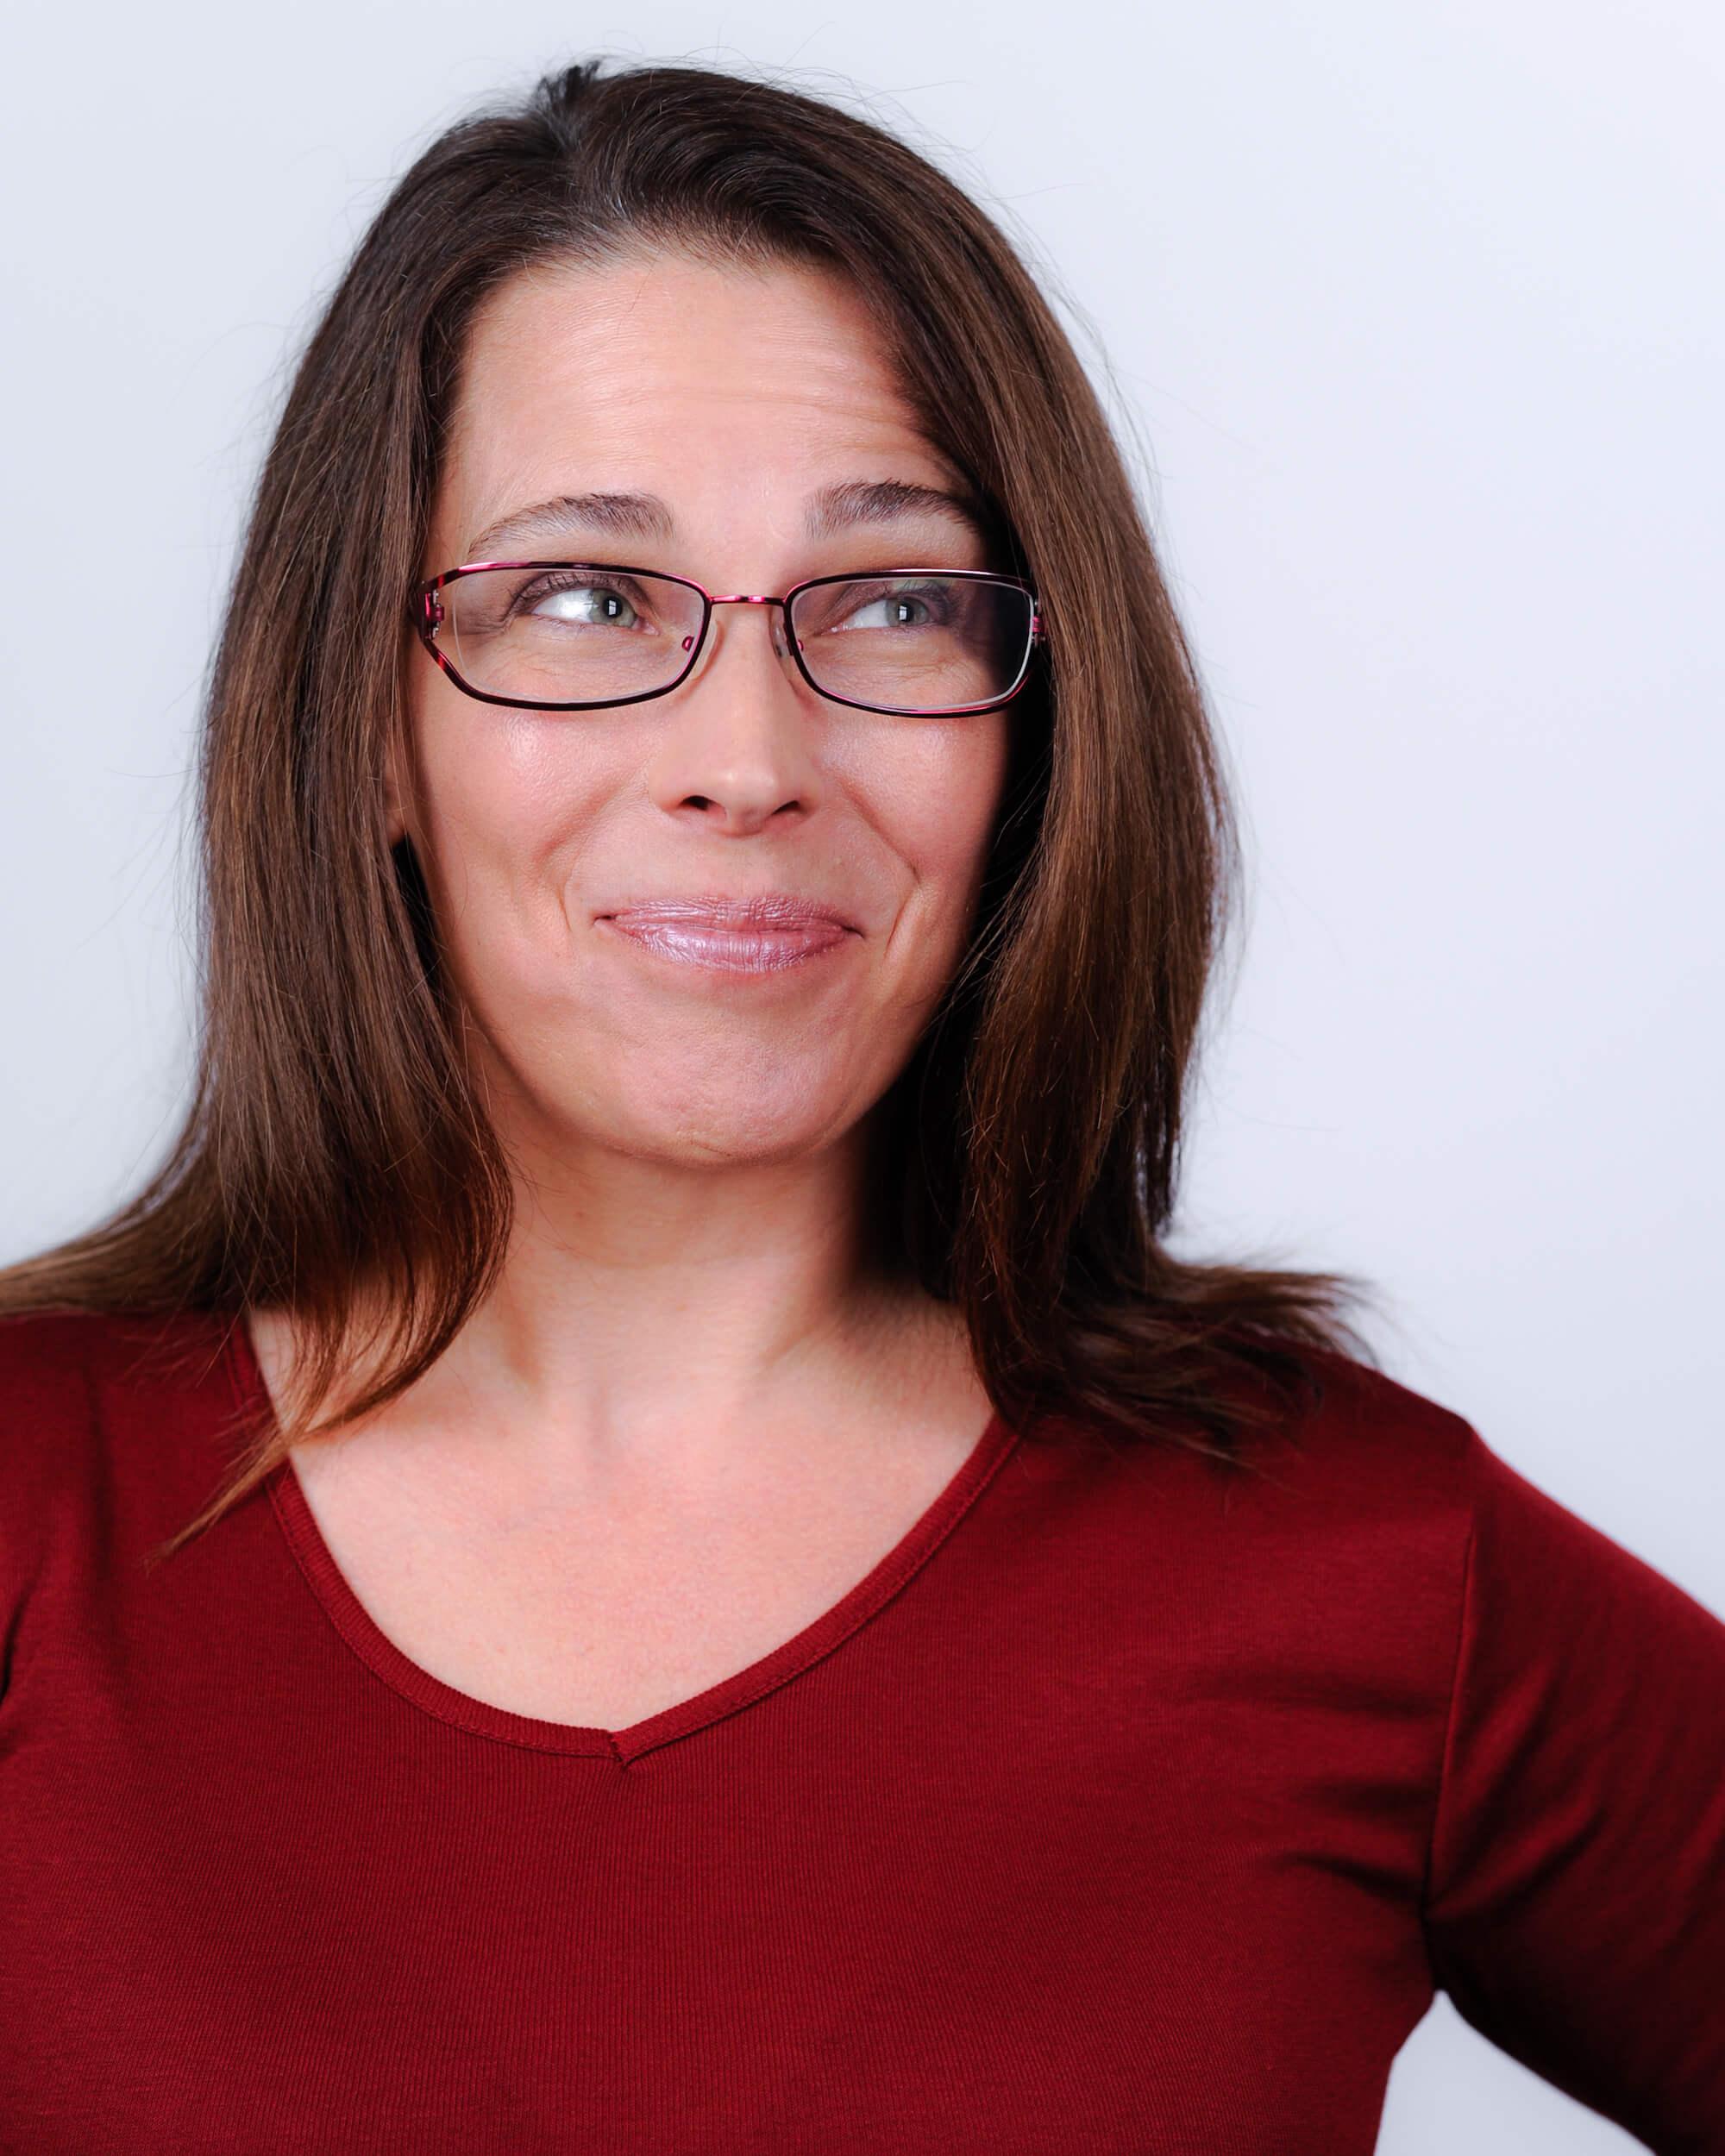 Mary Meyer headshot comedic.jpg